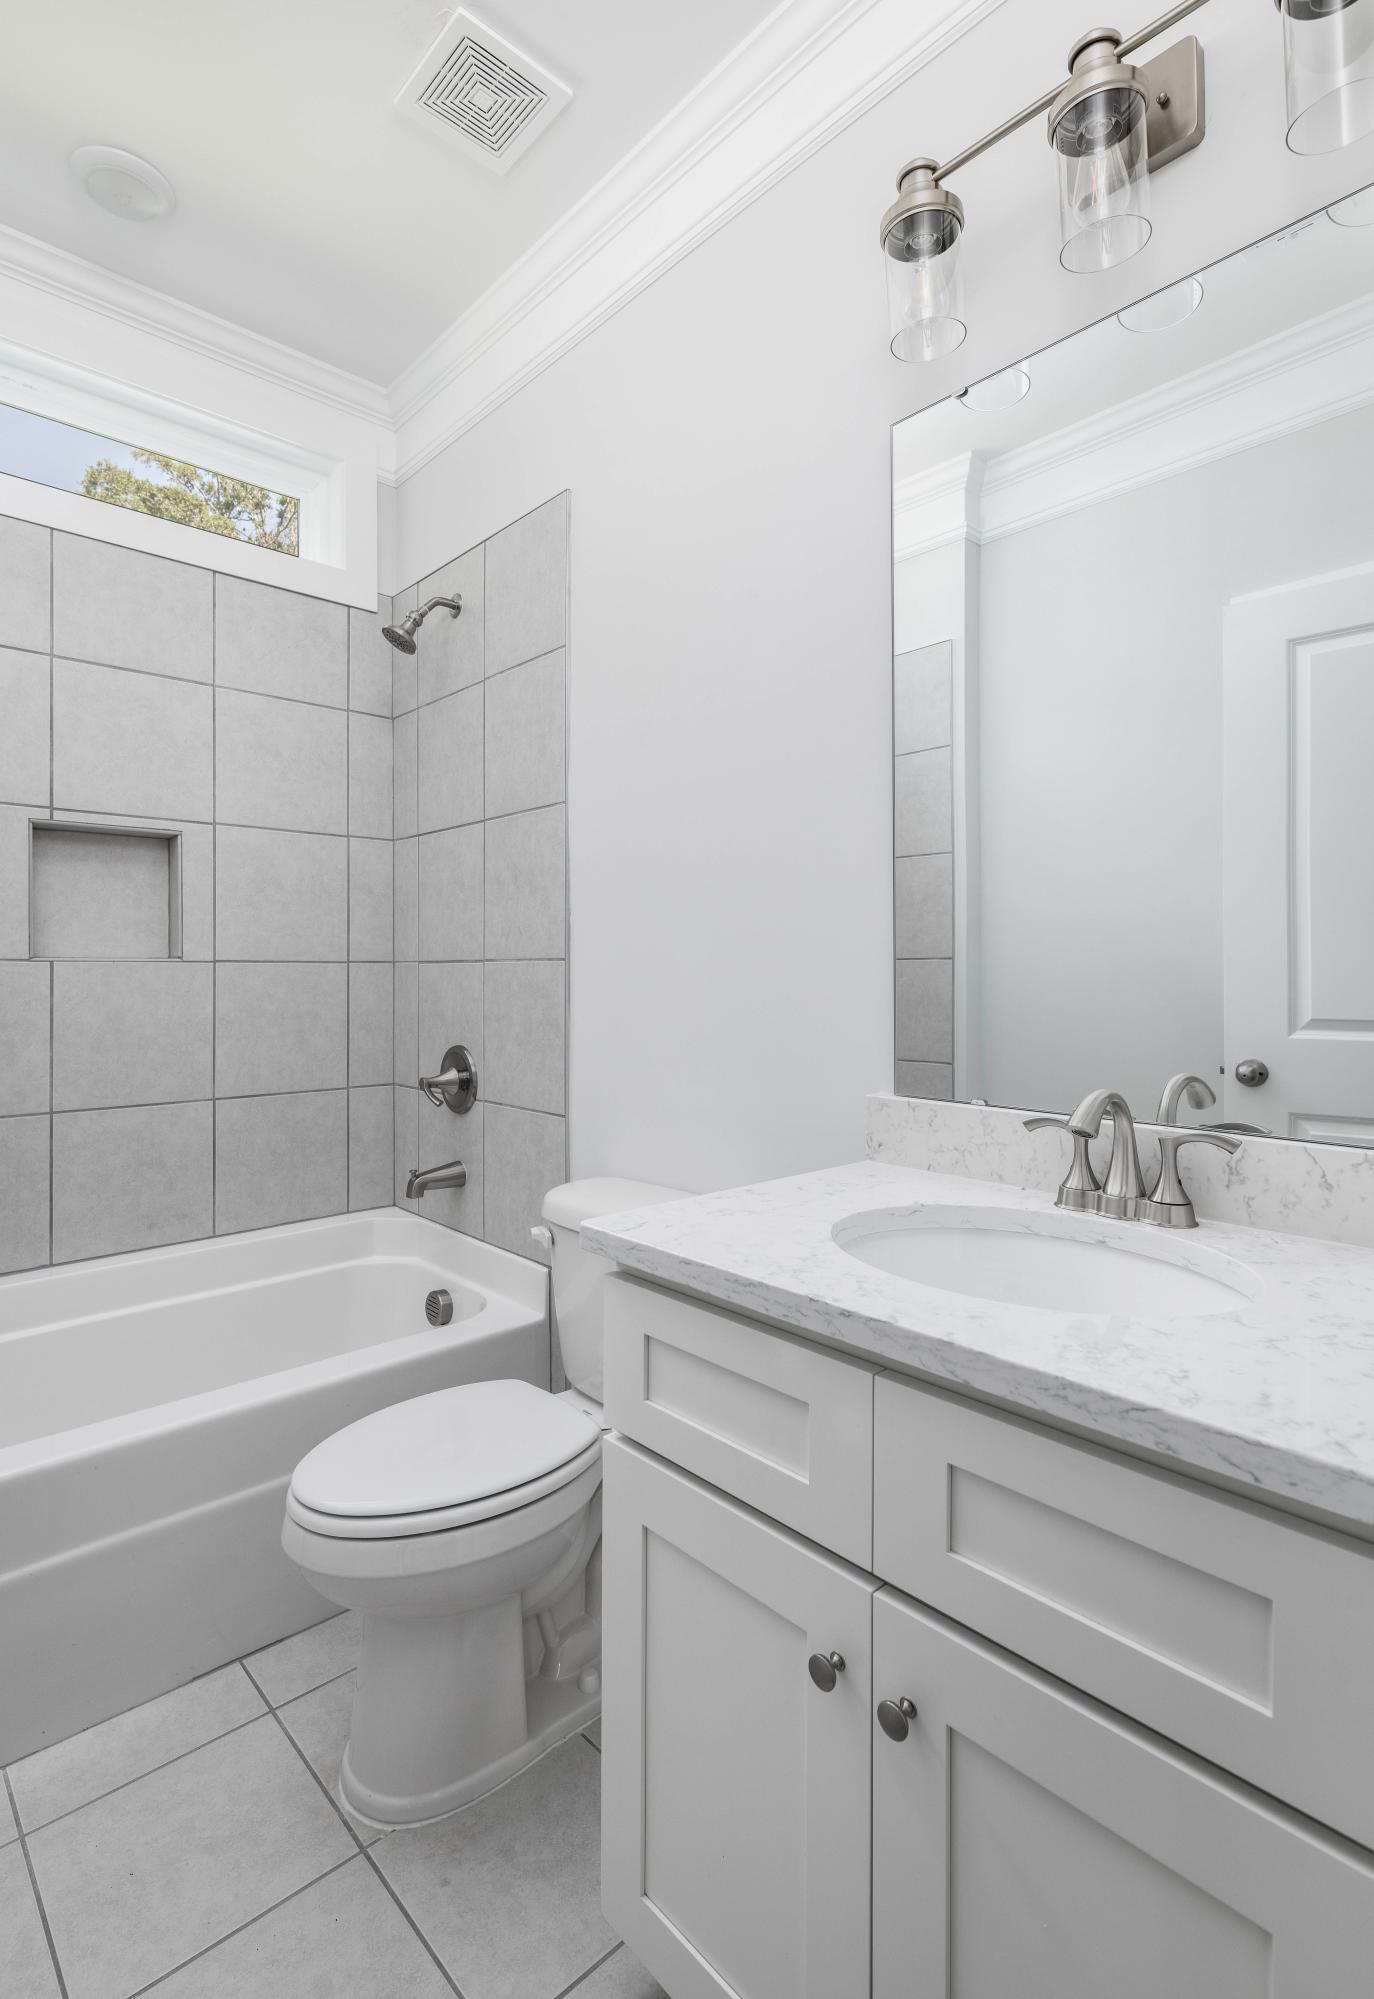 Scanlonville Homes For Sale - 217 7th, Mount Pleasant, SC - 4